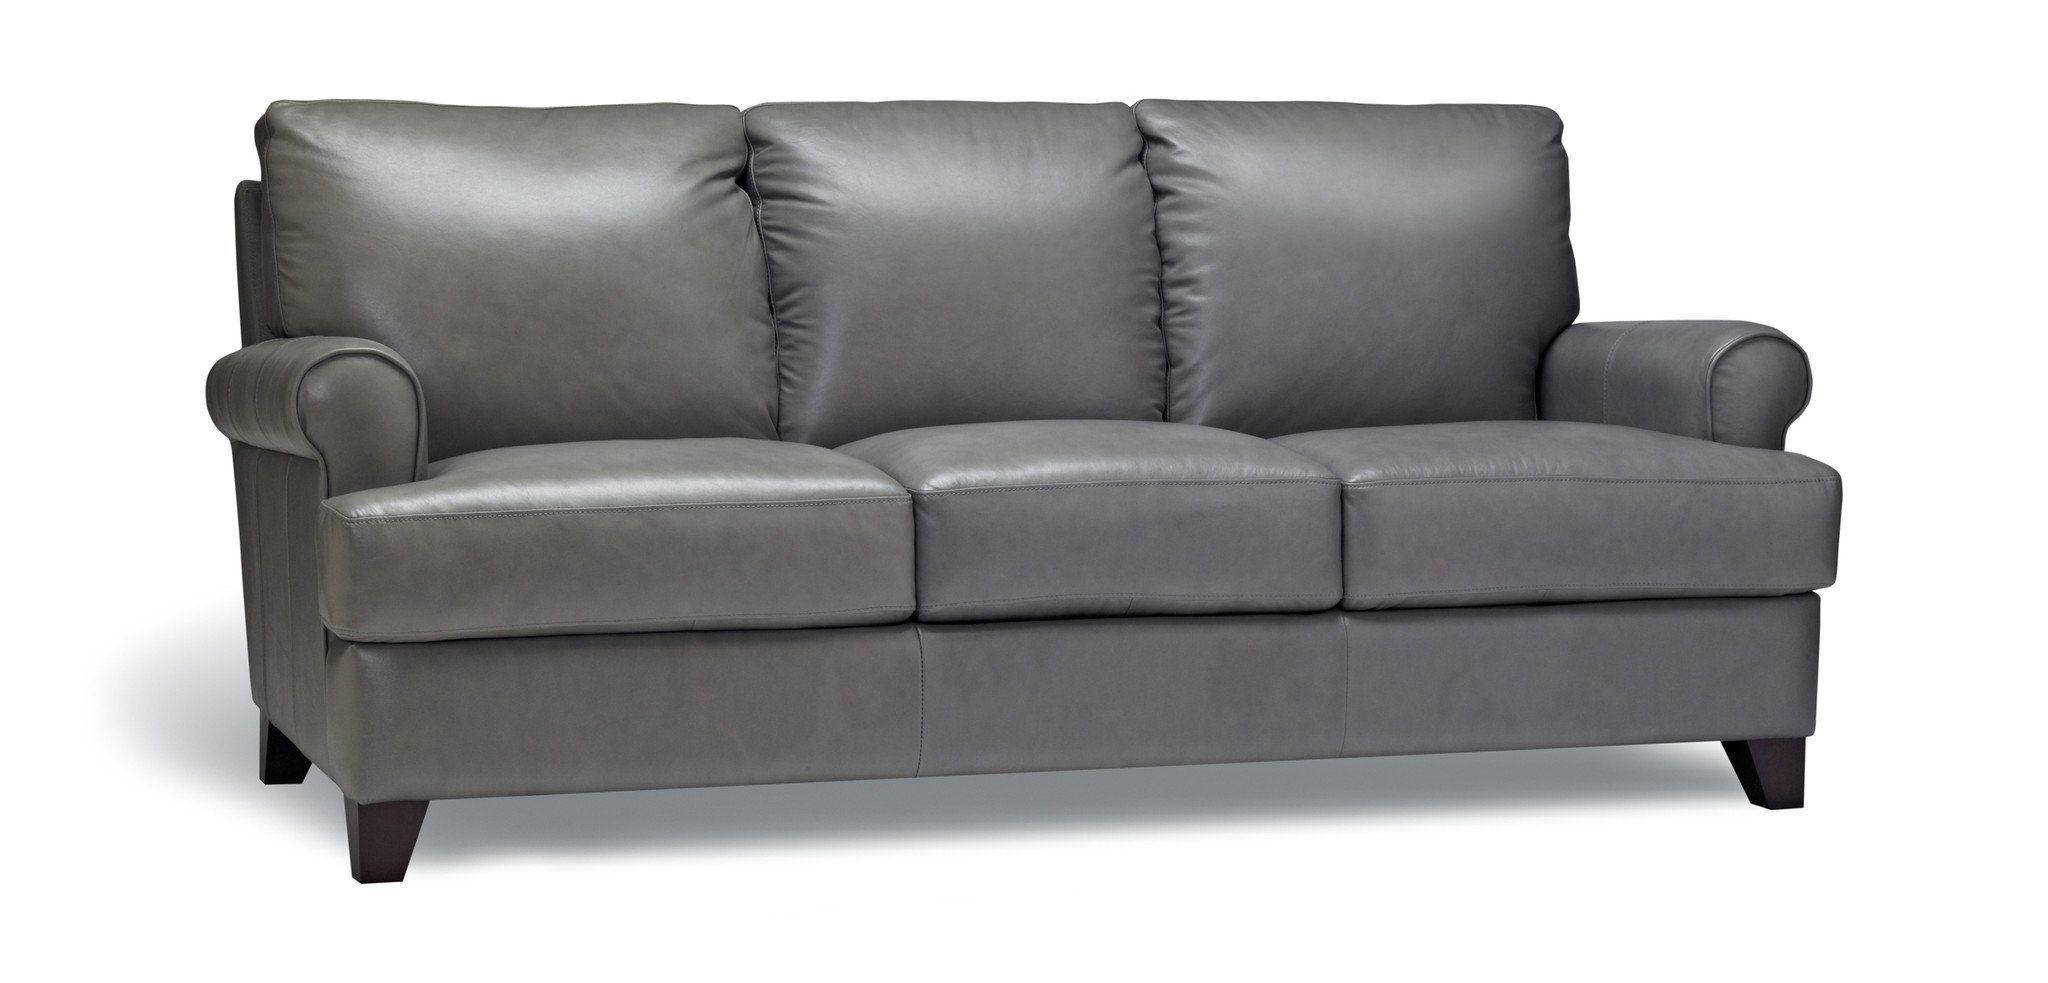 Sofas To Go Bart Sleeper Sofa Loveseat Or Chair Dillion Grey